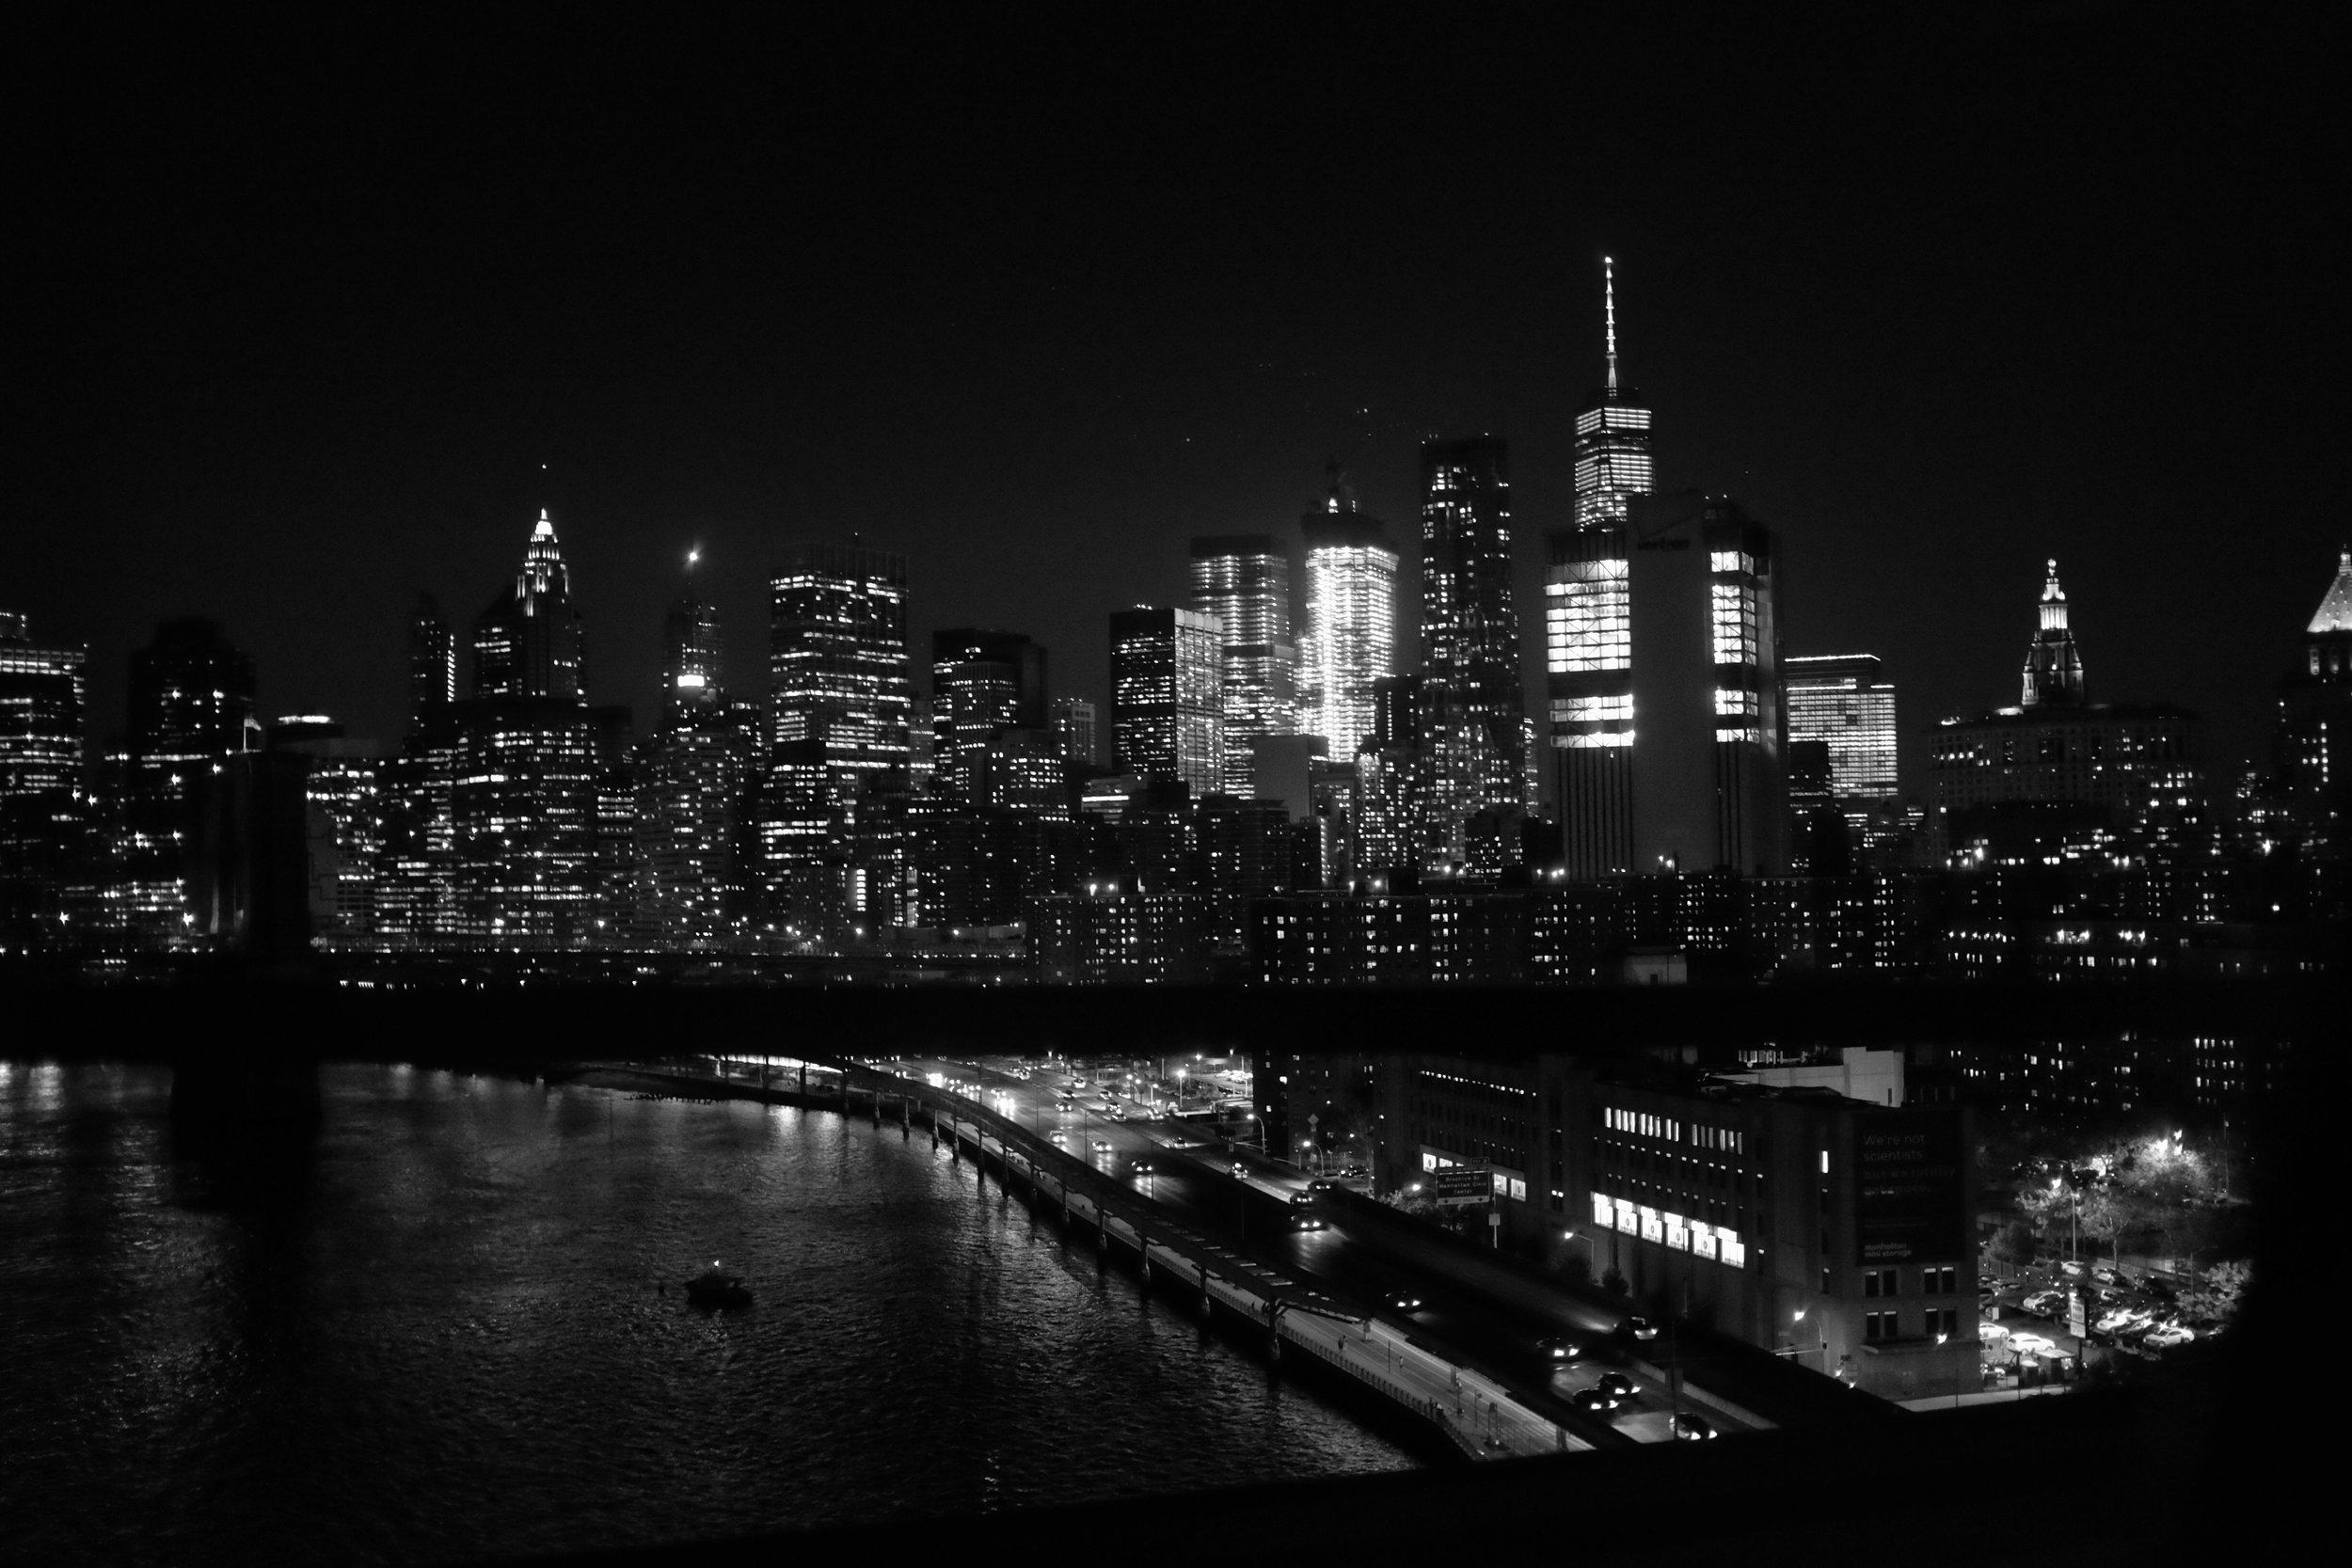 Lower Manhattan from the Manhattan Bridge. New York City. 2016.